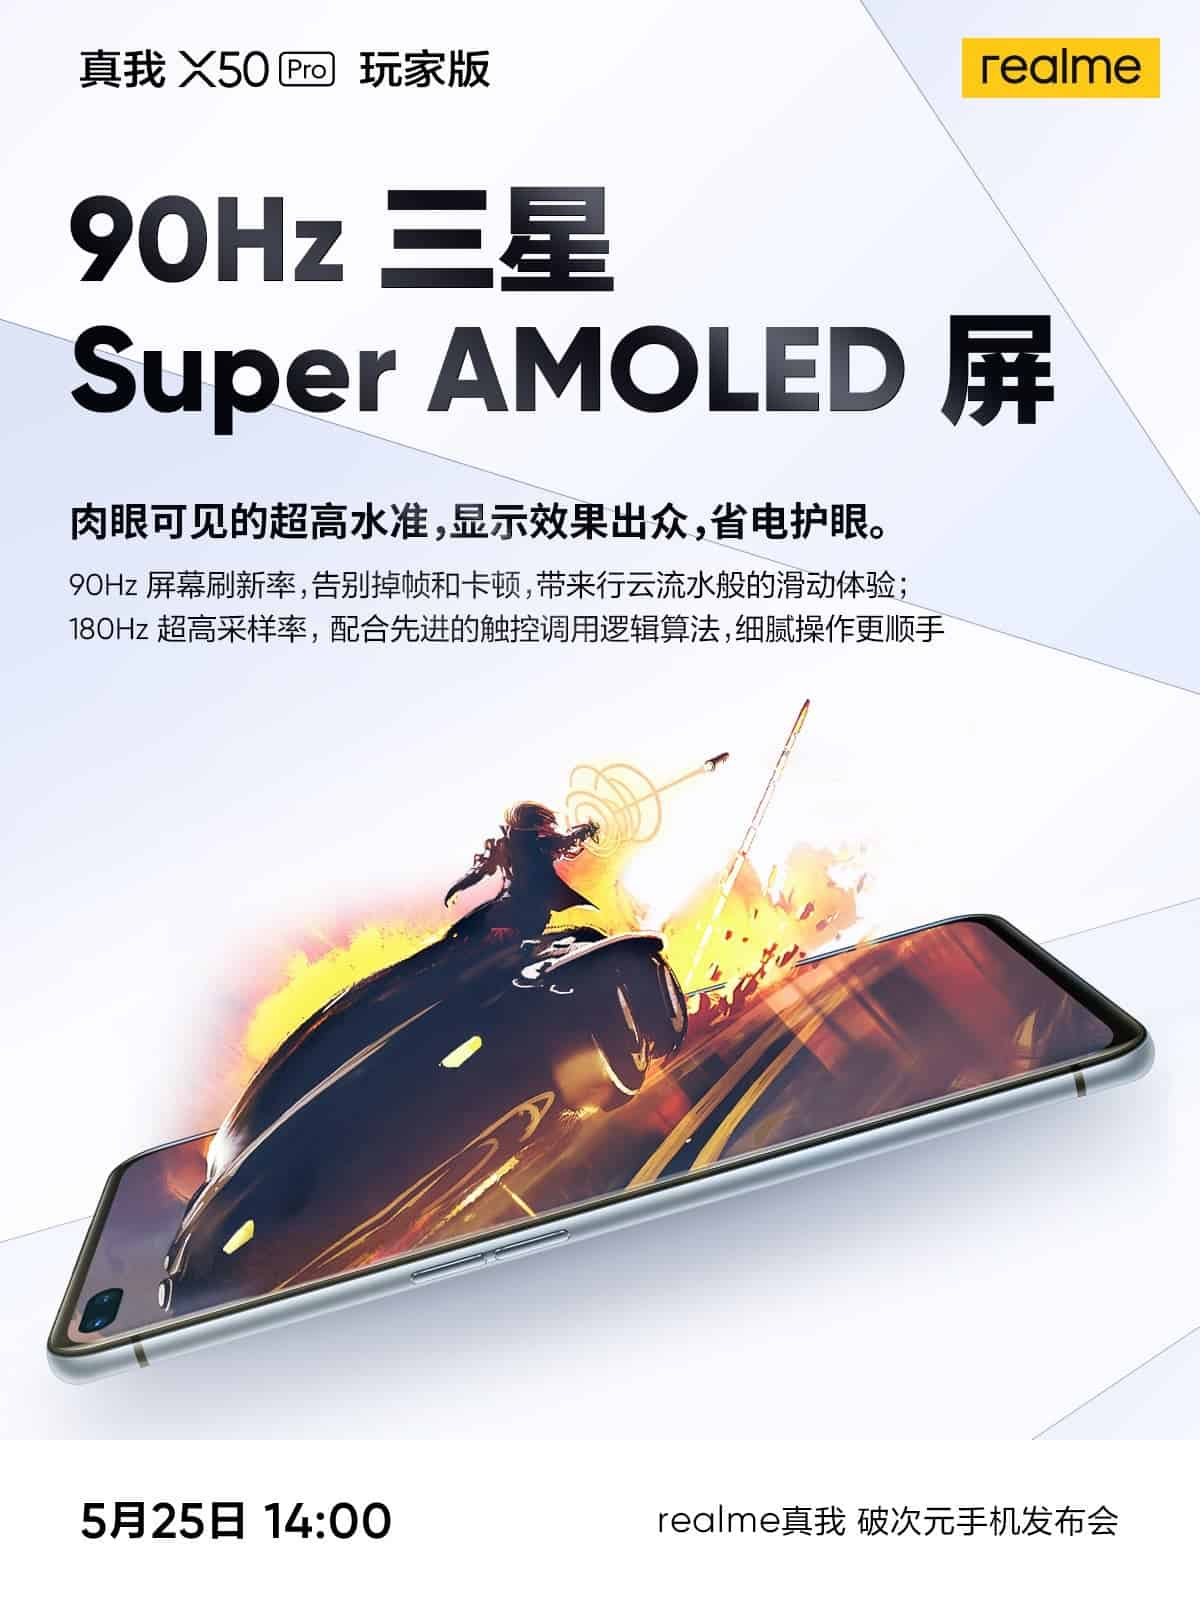 Realme X5 Pro Player